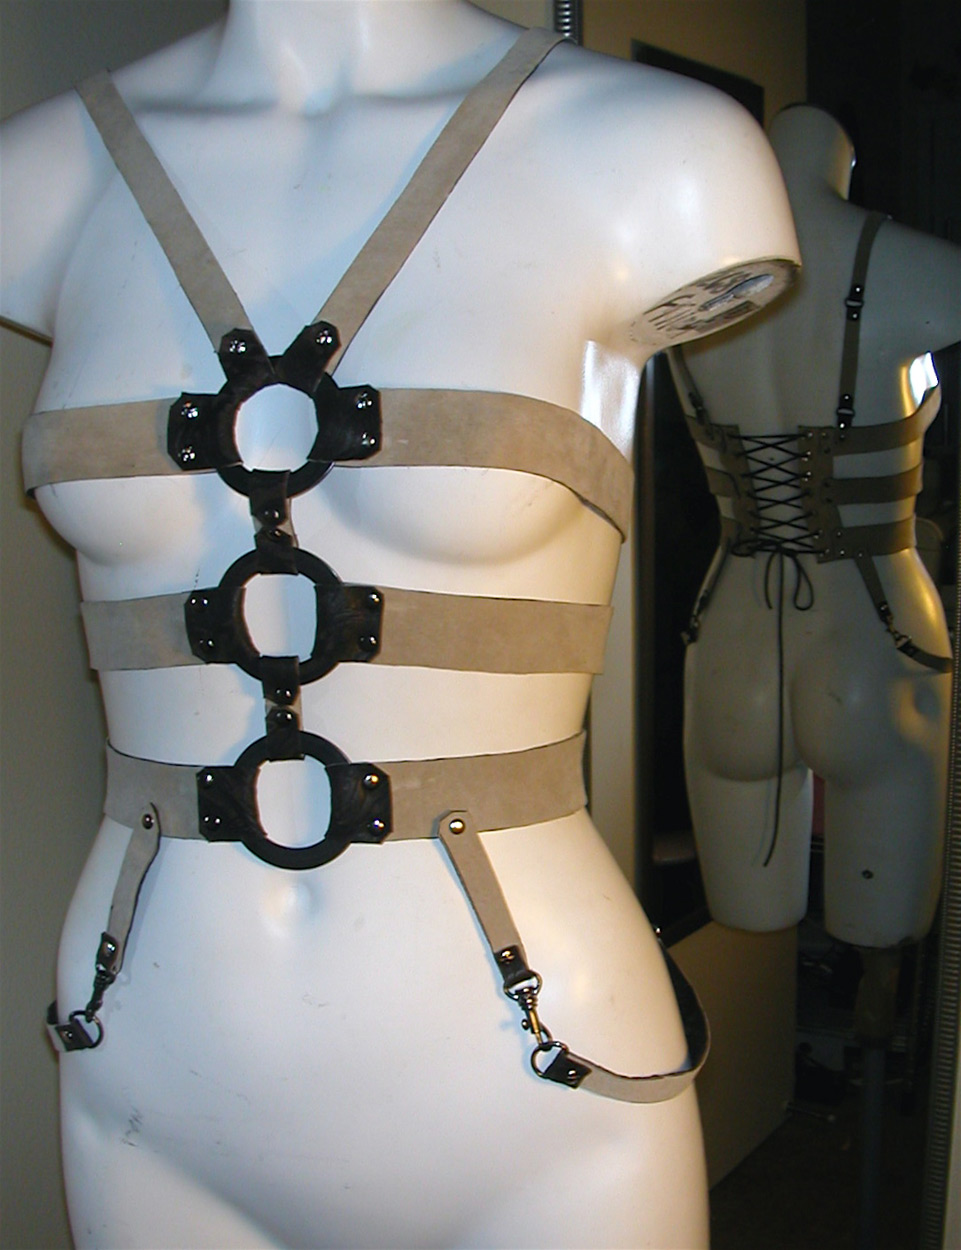 leather-harness-LS2-007.jpg